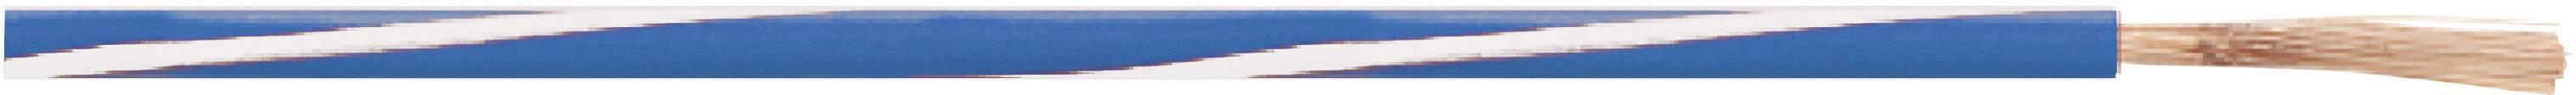 Opletenie / lanko LappKabel 4512292S X05V-K, 1 x 0.75 mm², vonkajší Ø 2.40 mm, metrový tovar, hnedá, biela